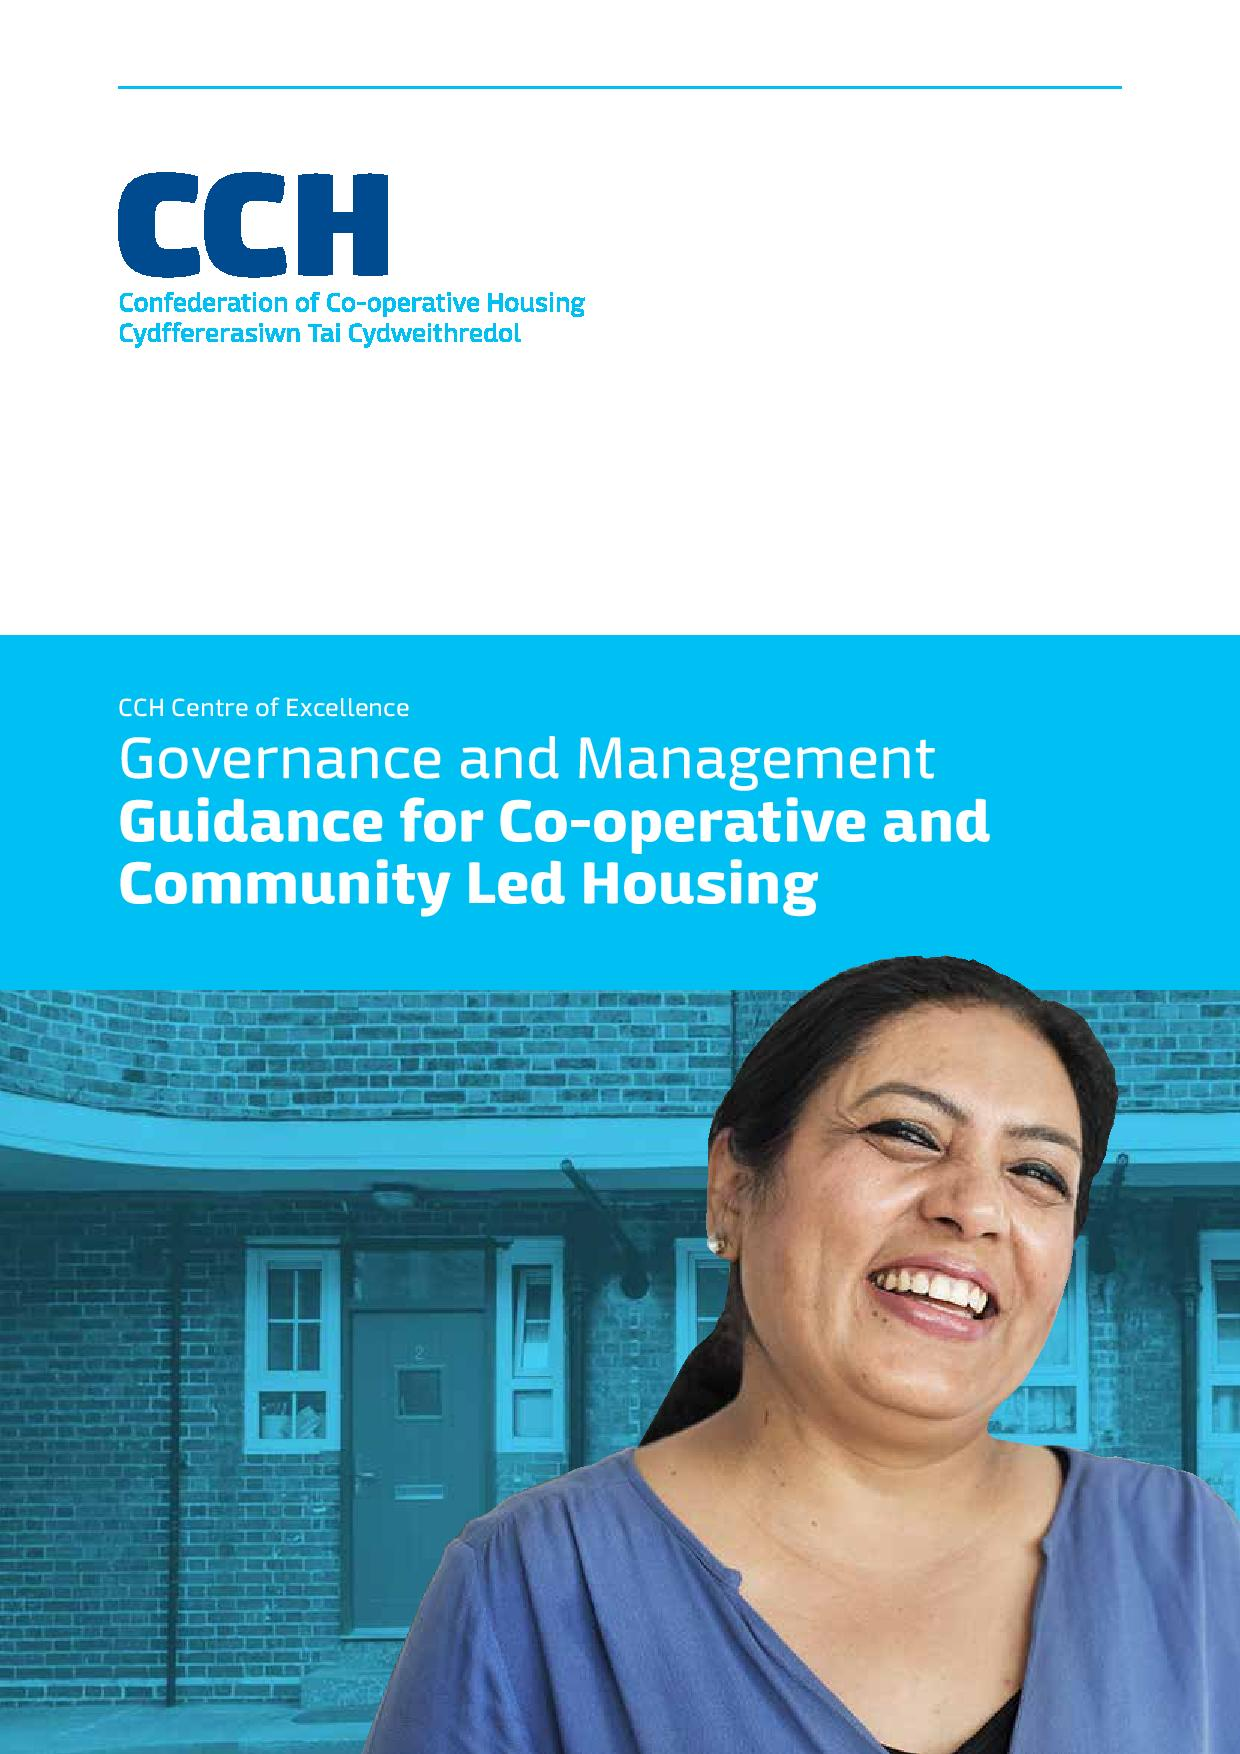 CCH-Governance-Management-Guidance-2017